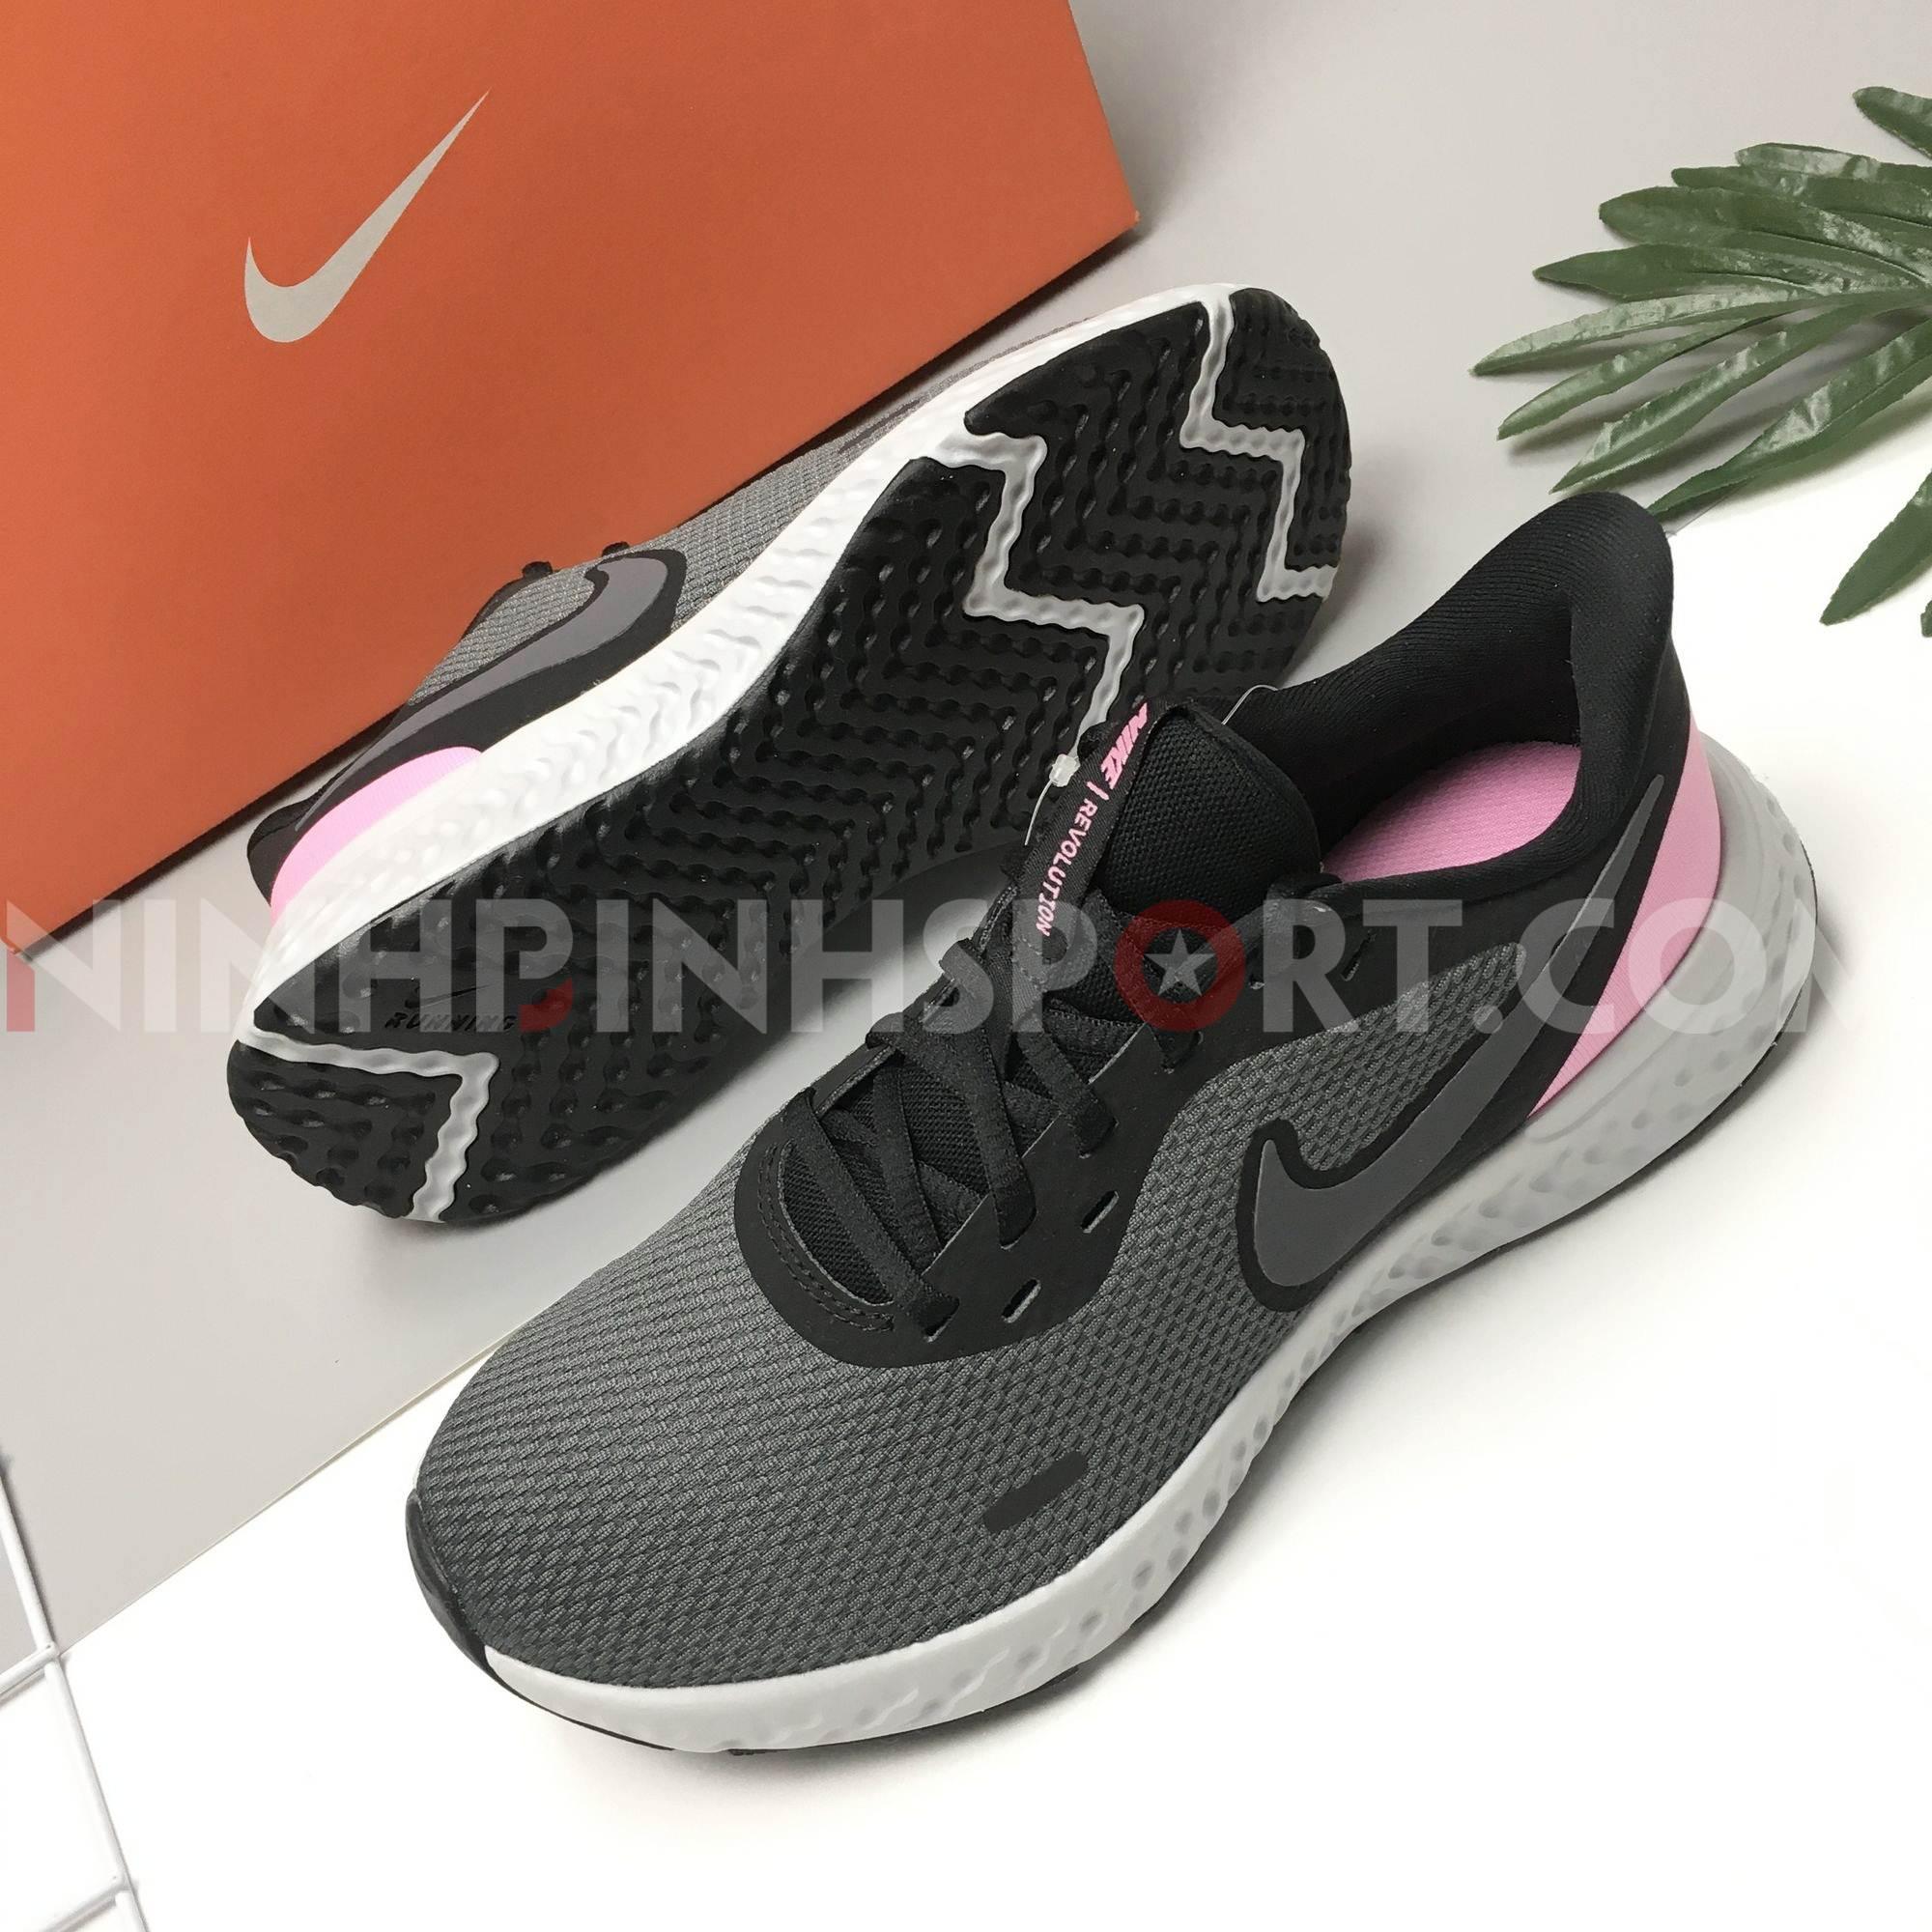 Giầy thể thao nữ Nike Revolution 5 BQ3207-004